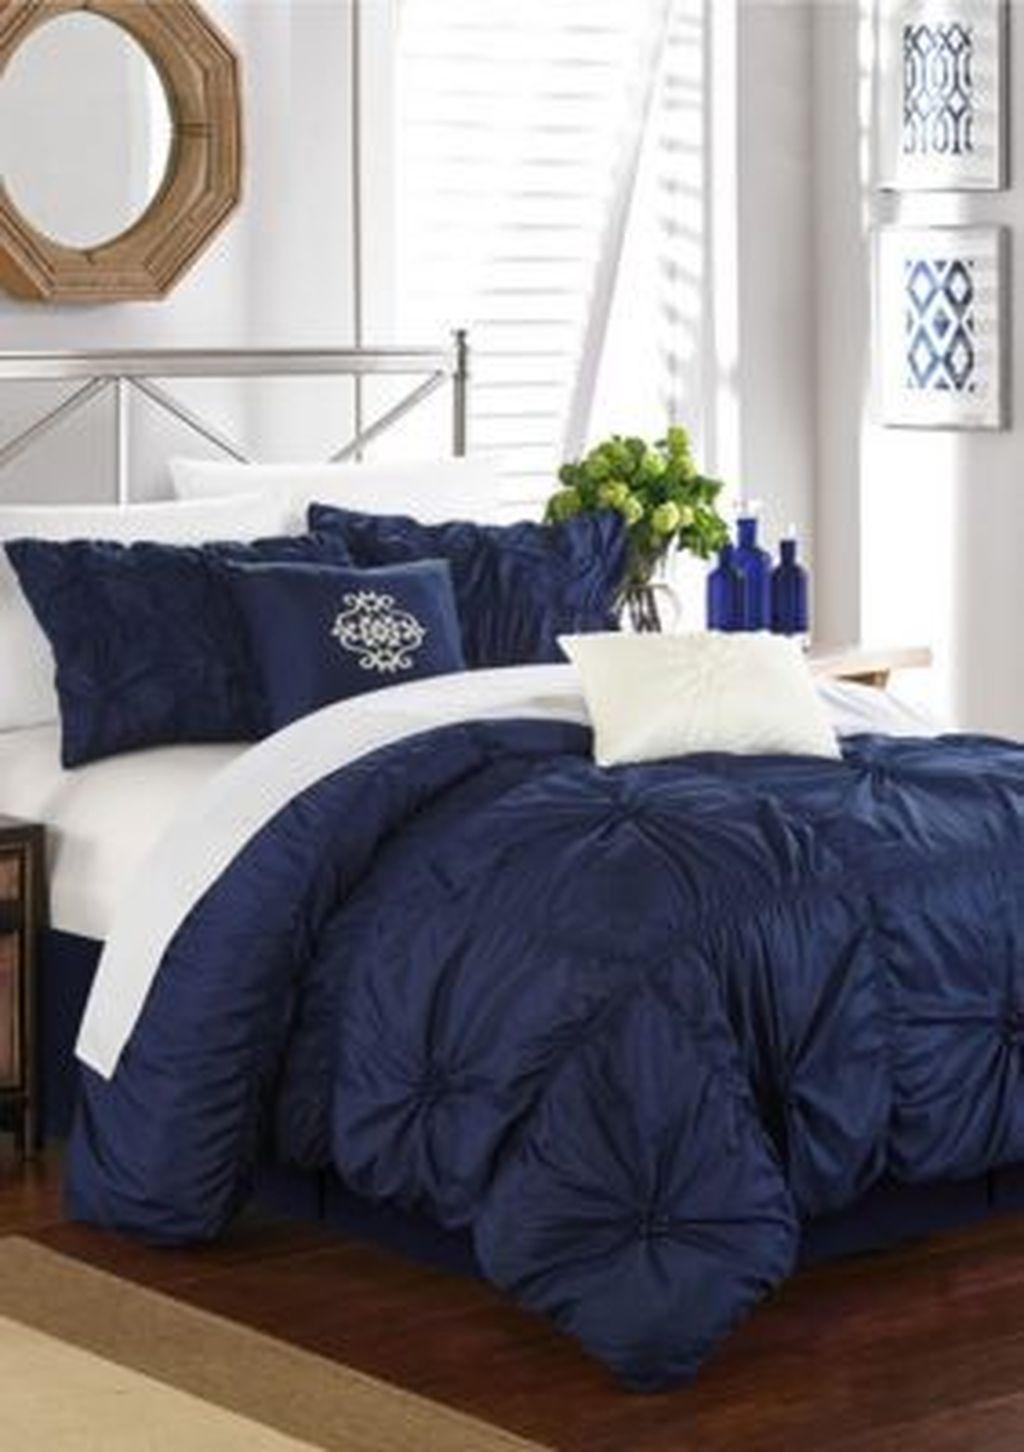 Inspiring Navy Blue Bedroom Decor Ideas You Should Copy 04